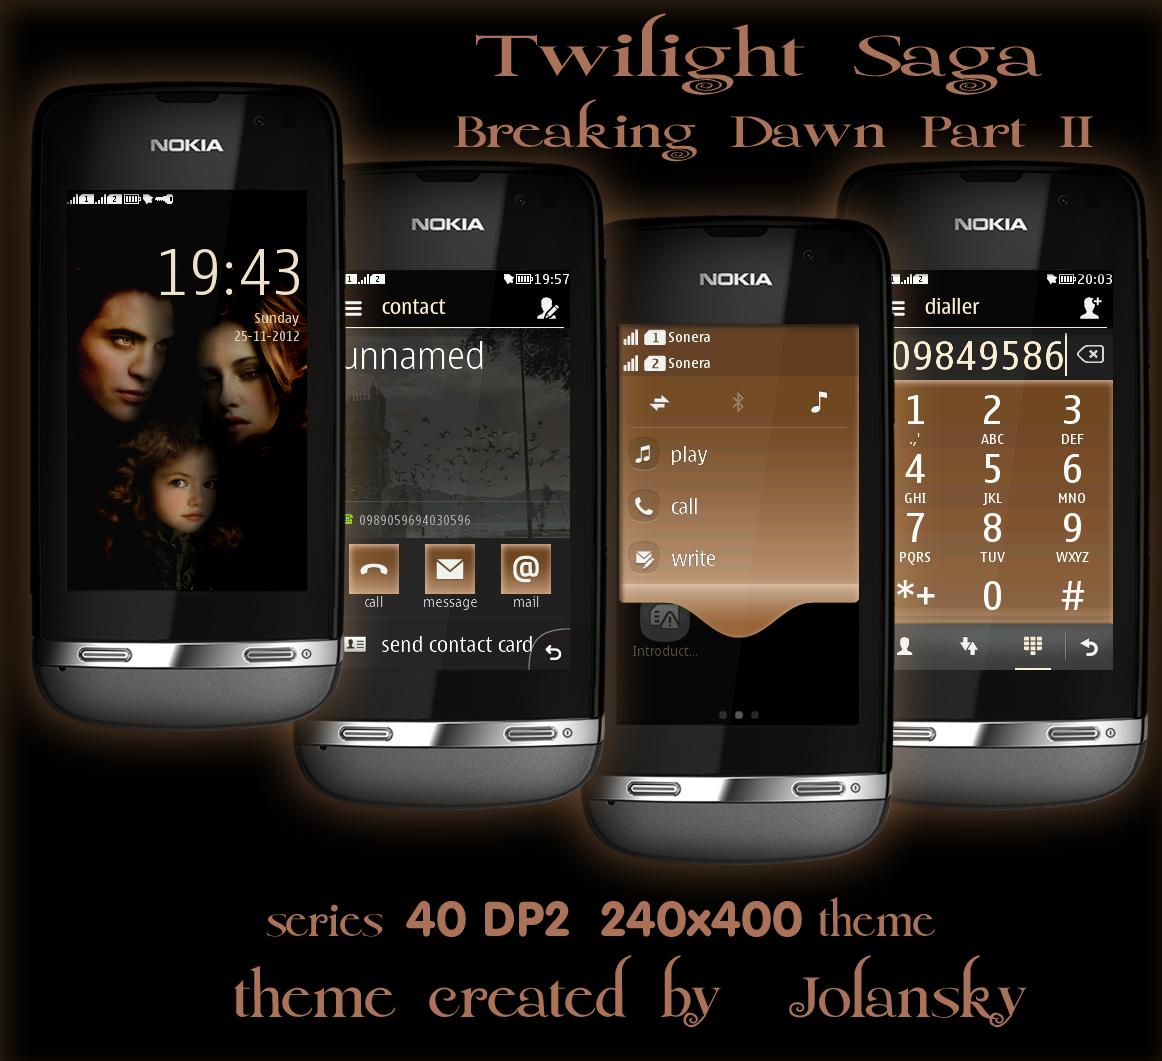 ... , Search results for Lumia Theme For Nokia Asha 305 Asha 306 Asha 311